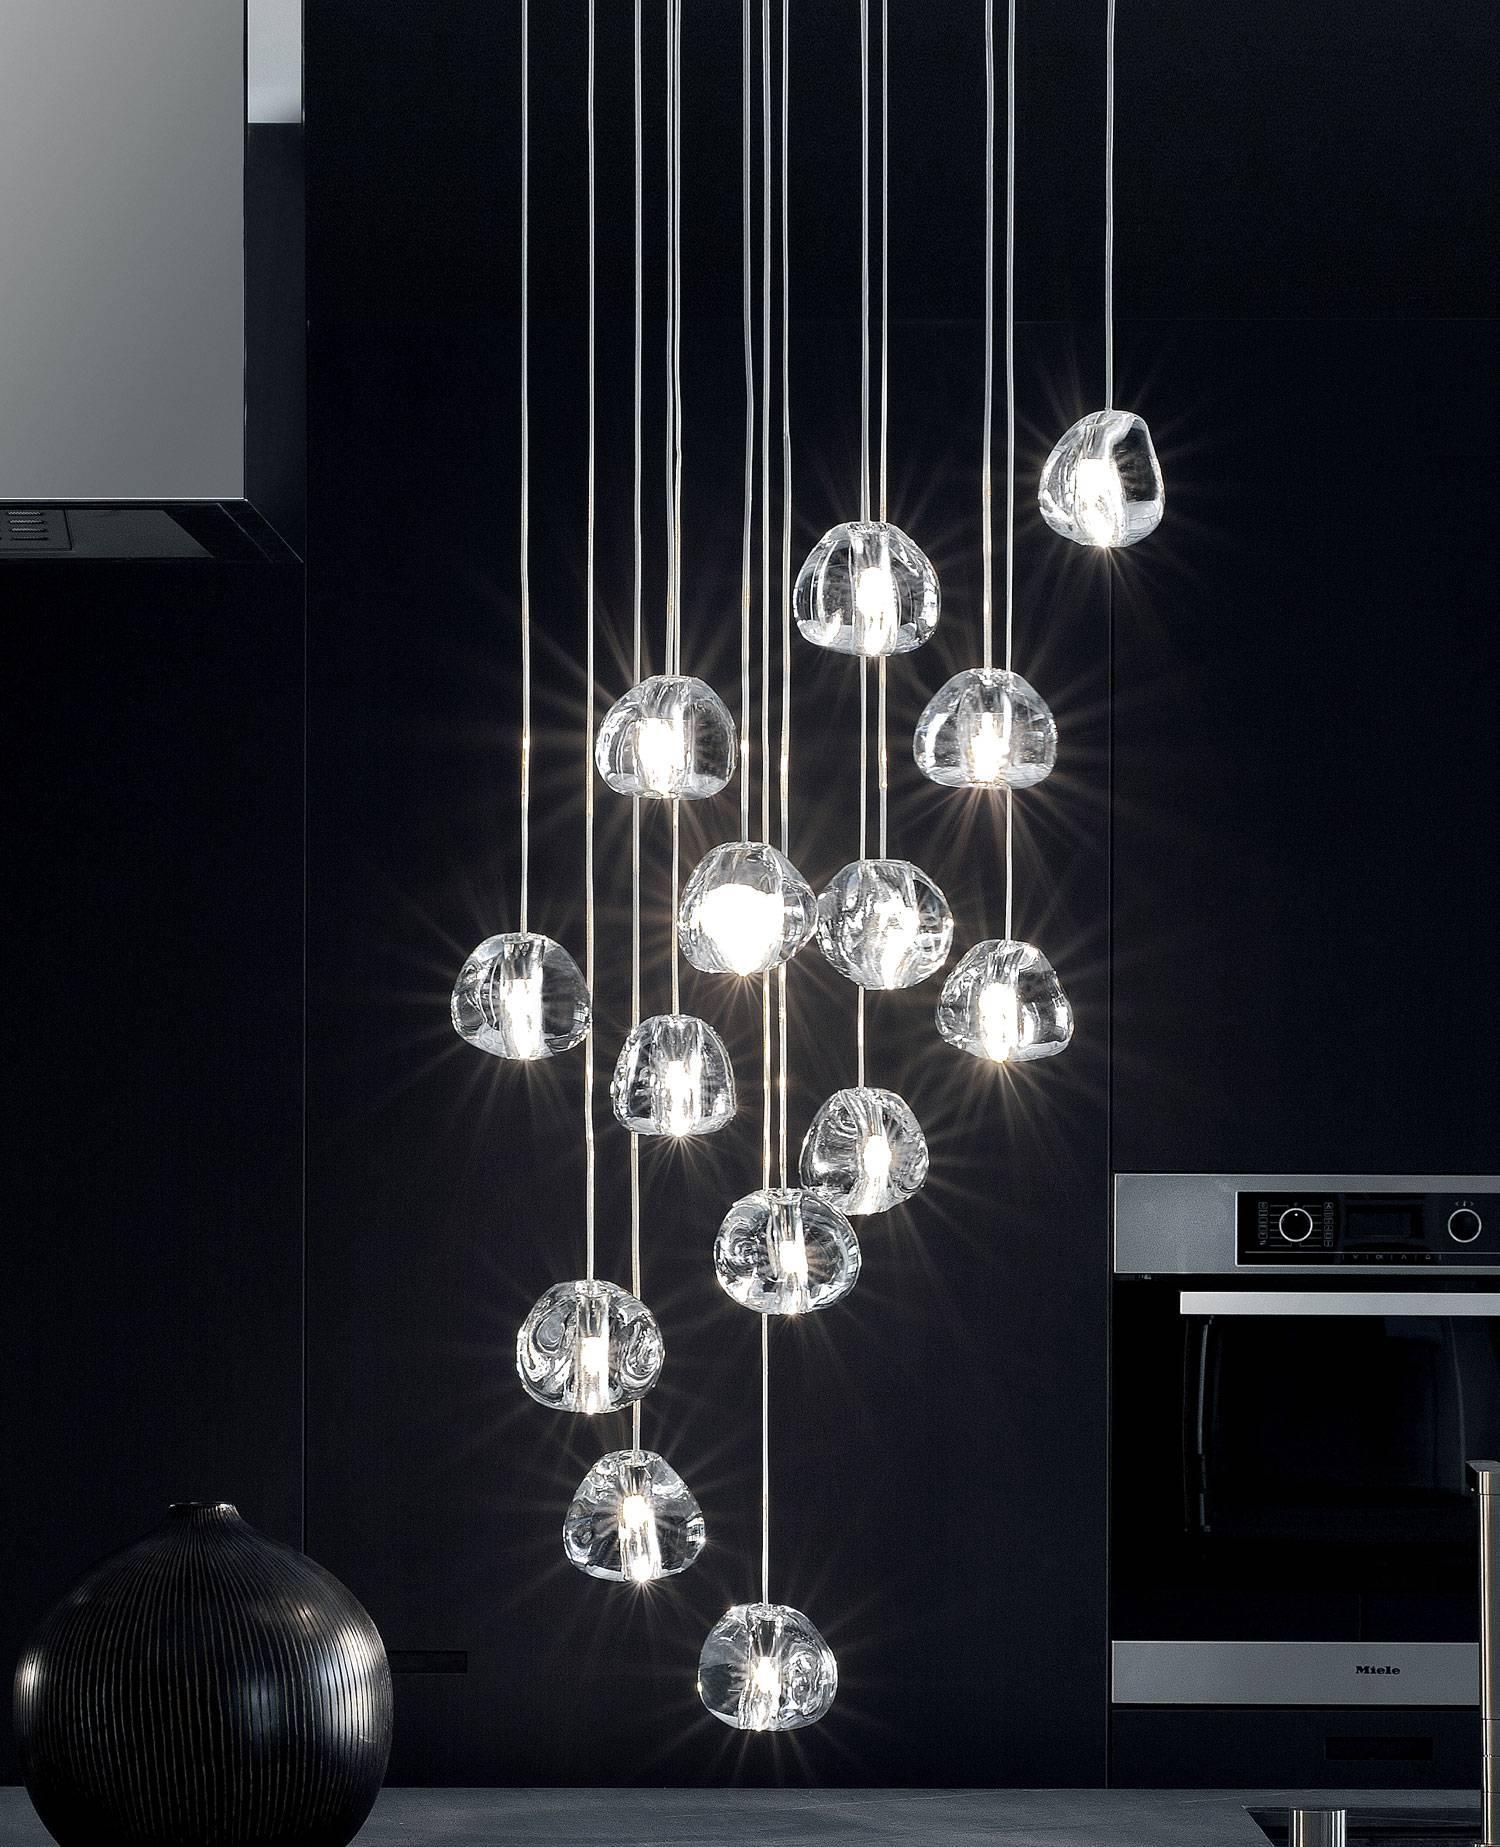 Mizu R15S Pendant Lightterzani | Interior-Deluxe regarding Mizu Lighting (Image 7 of 15)